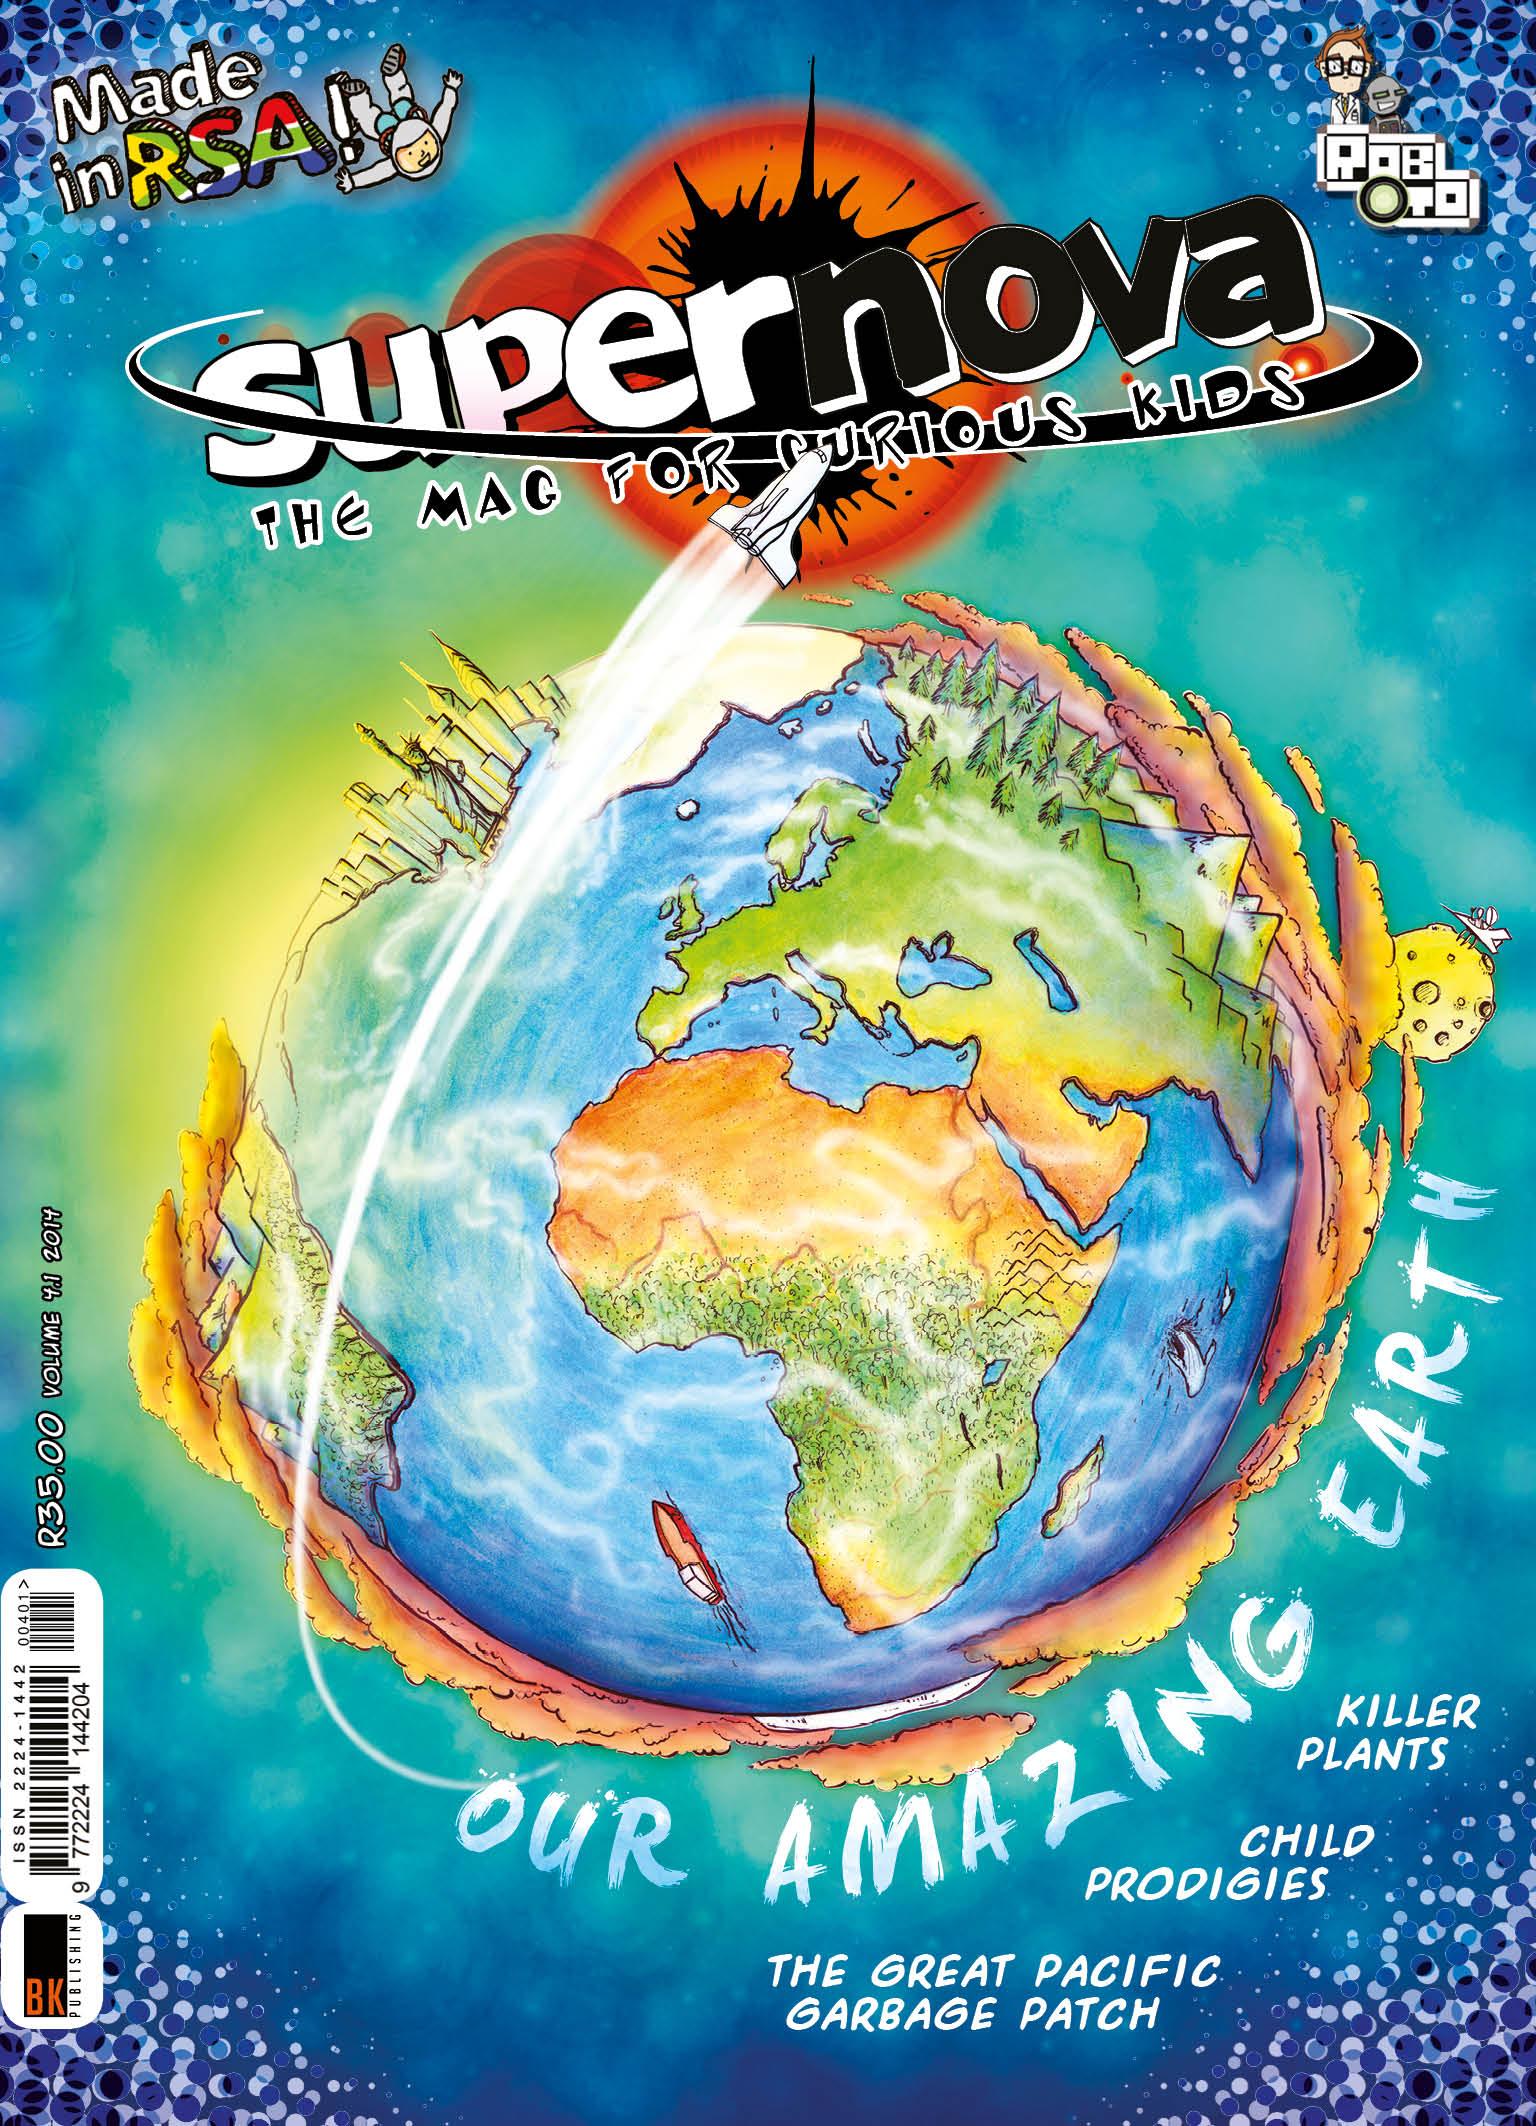 Supernova Vol. 4.1 Our Amazing Earth